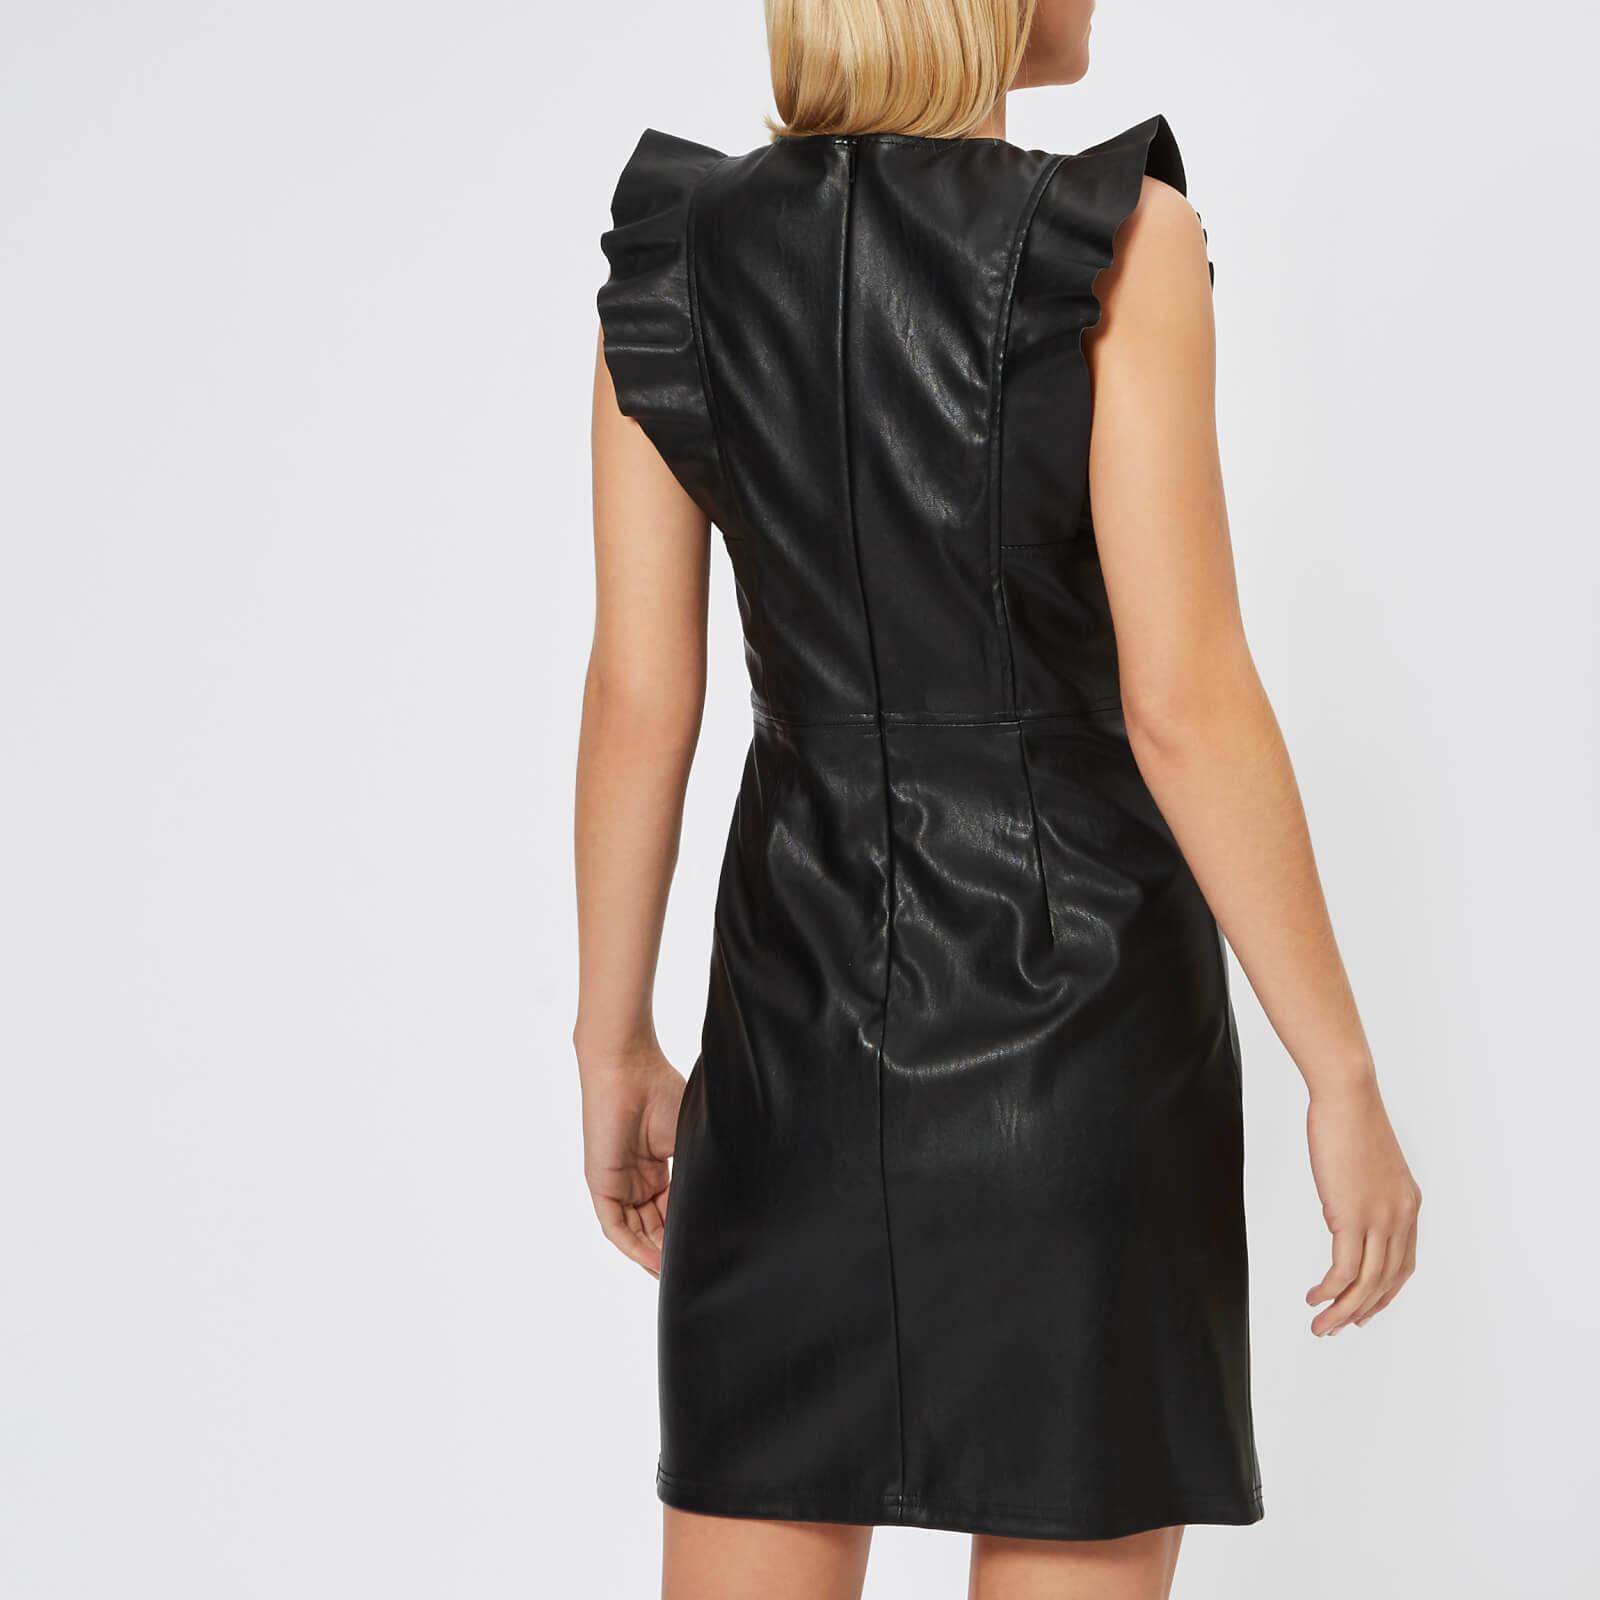 356819dcb0 Armani Exchange - Black Stretch Echo Leather Look Dress - Lyst. View  fullscreen